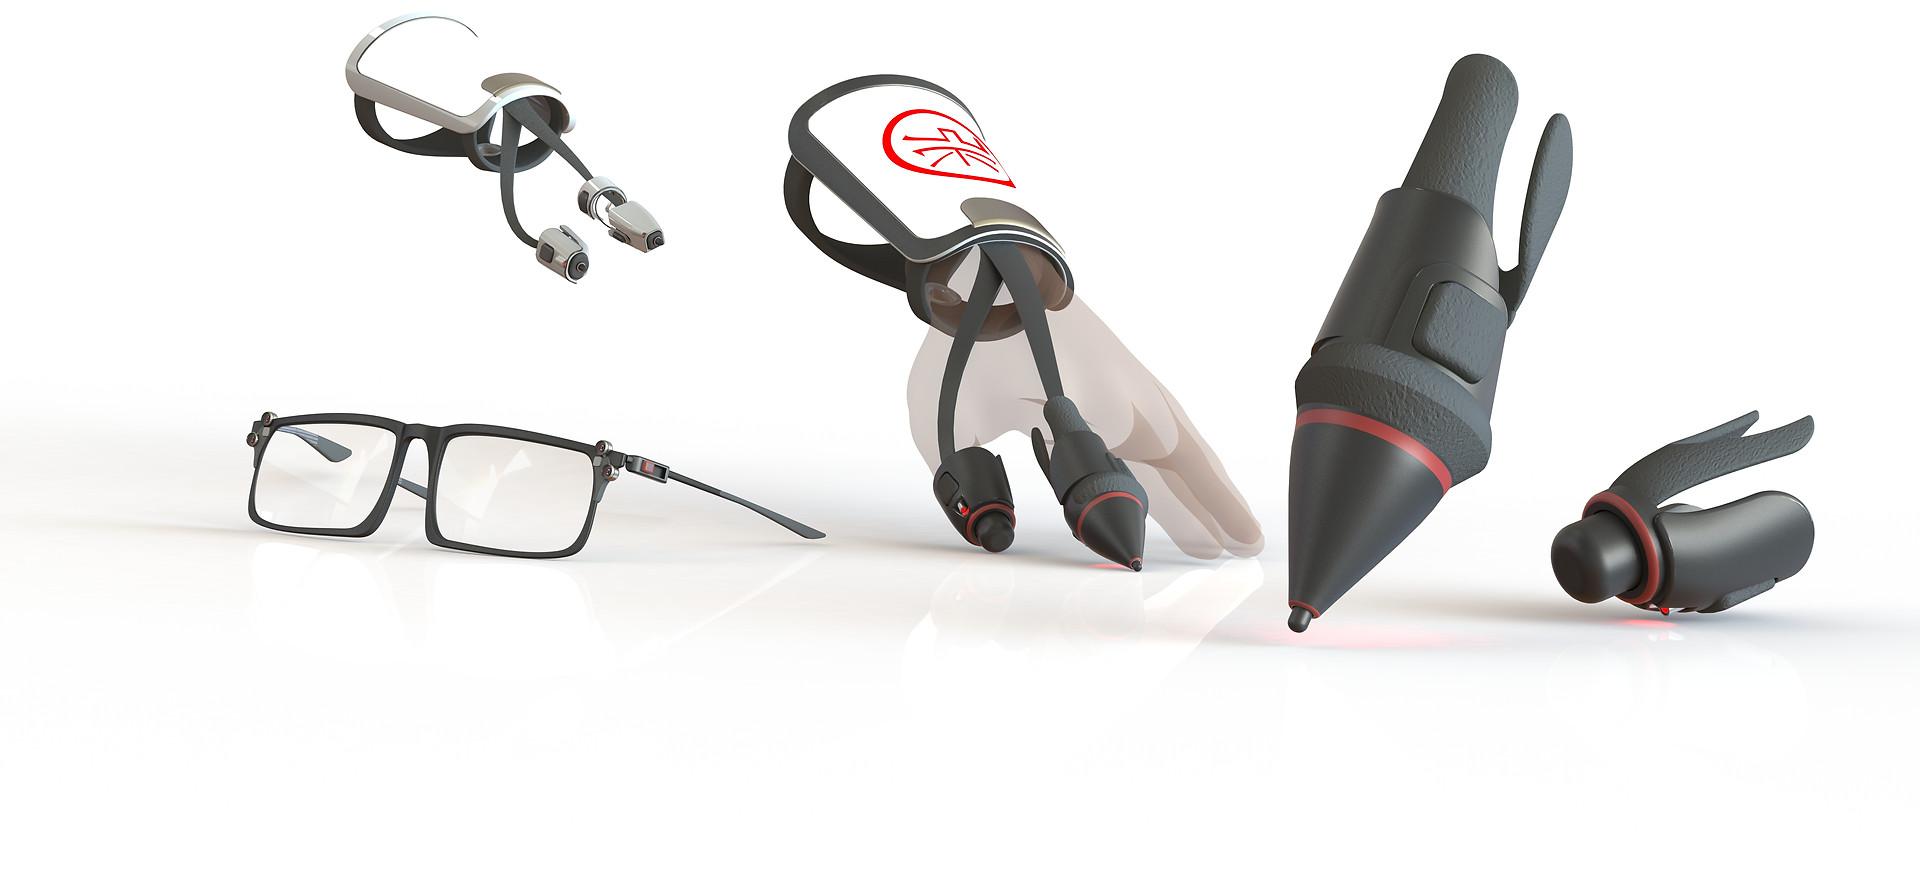 Omnilux: AR design controls